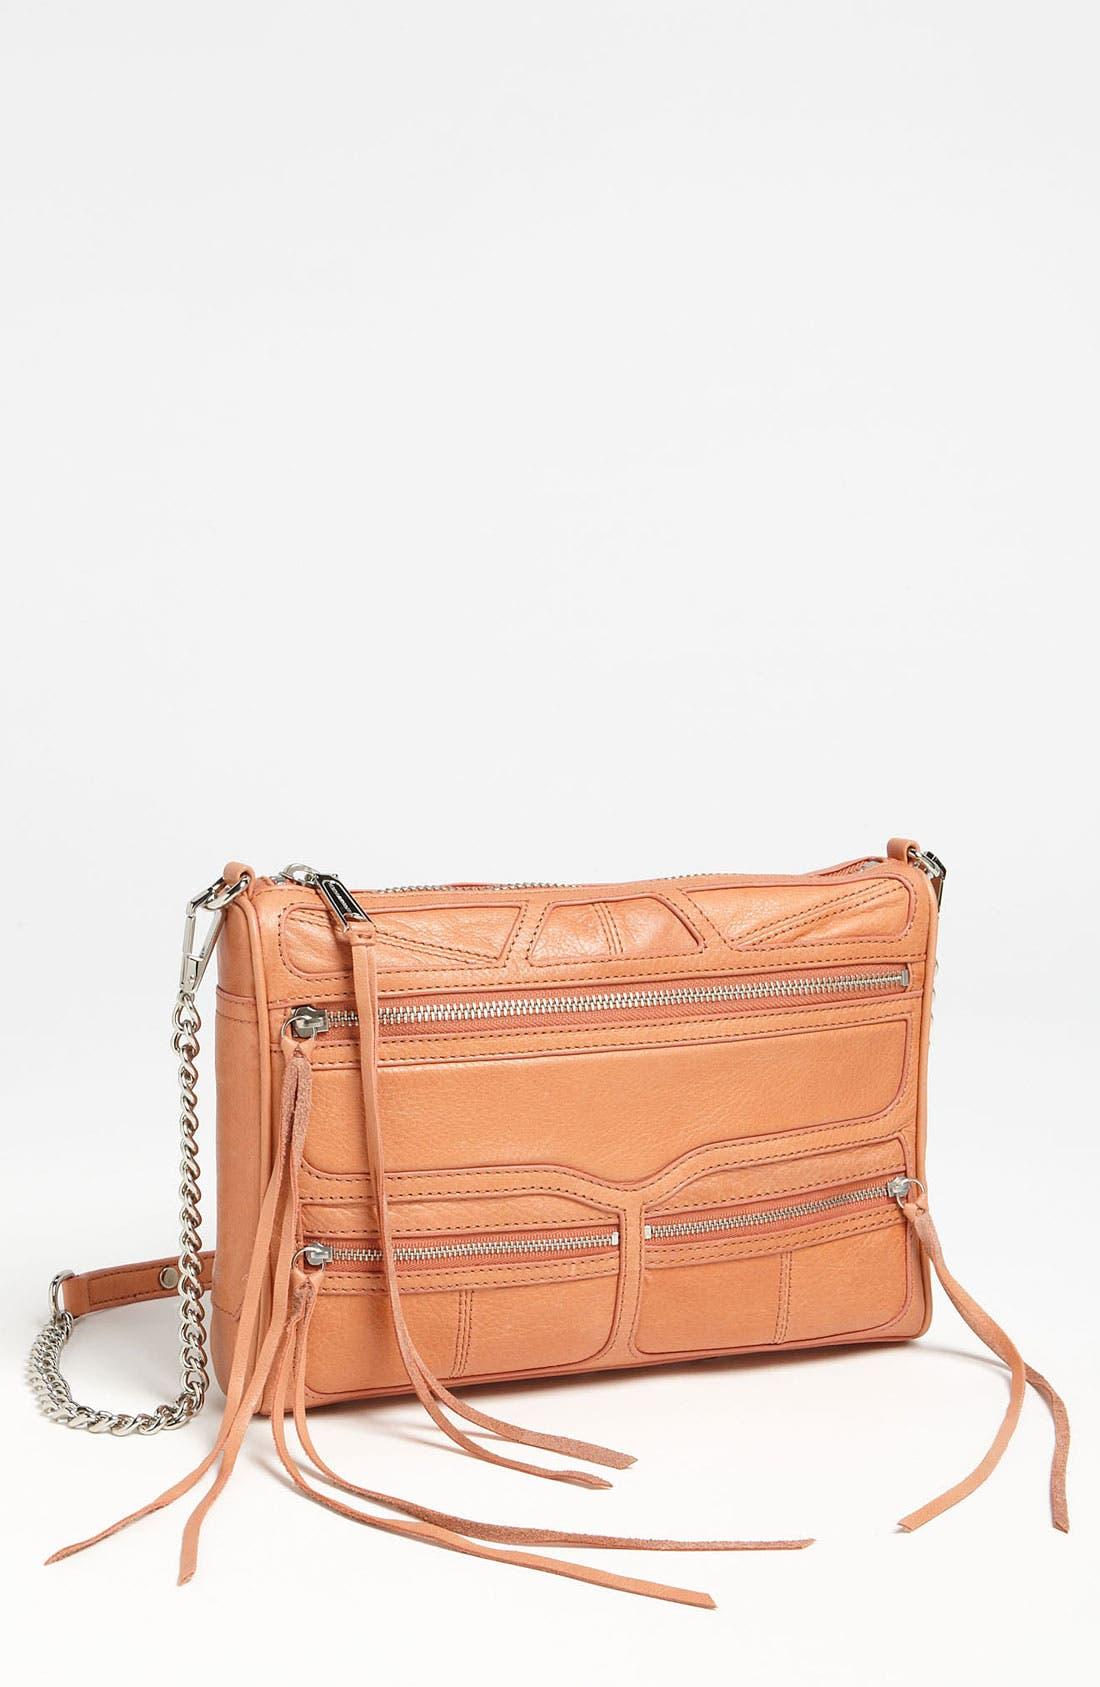 Alternate Image 1 Selected - Rebecca Minkoff '3 Zip MAC' Shoulder Bag